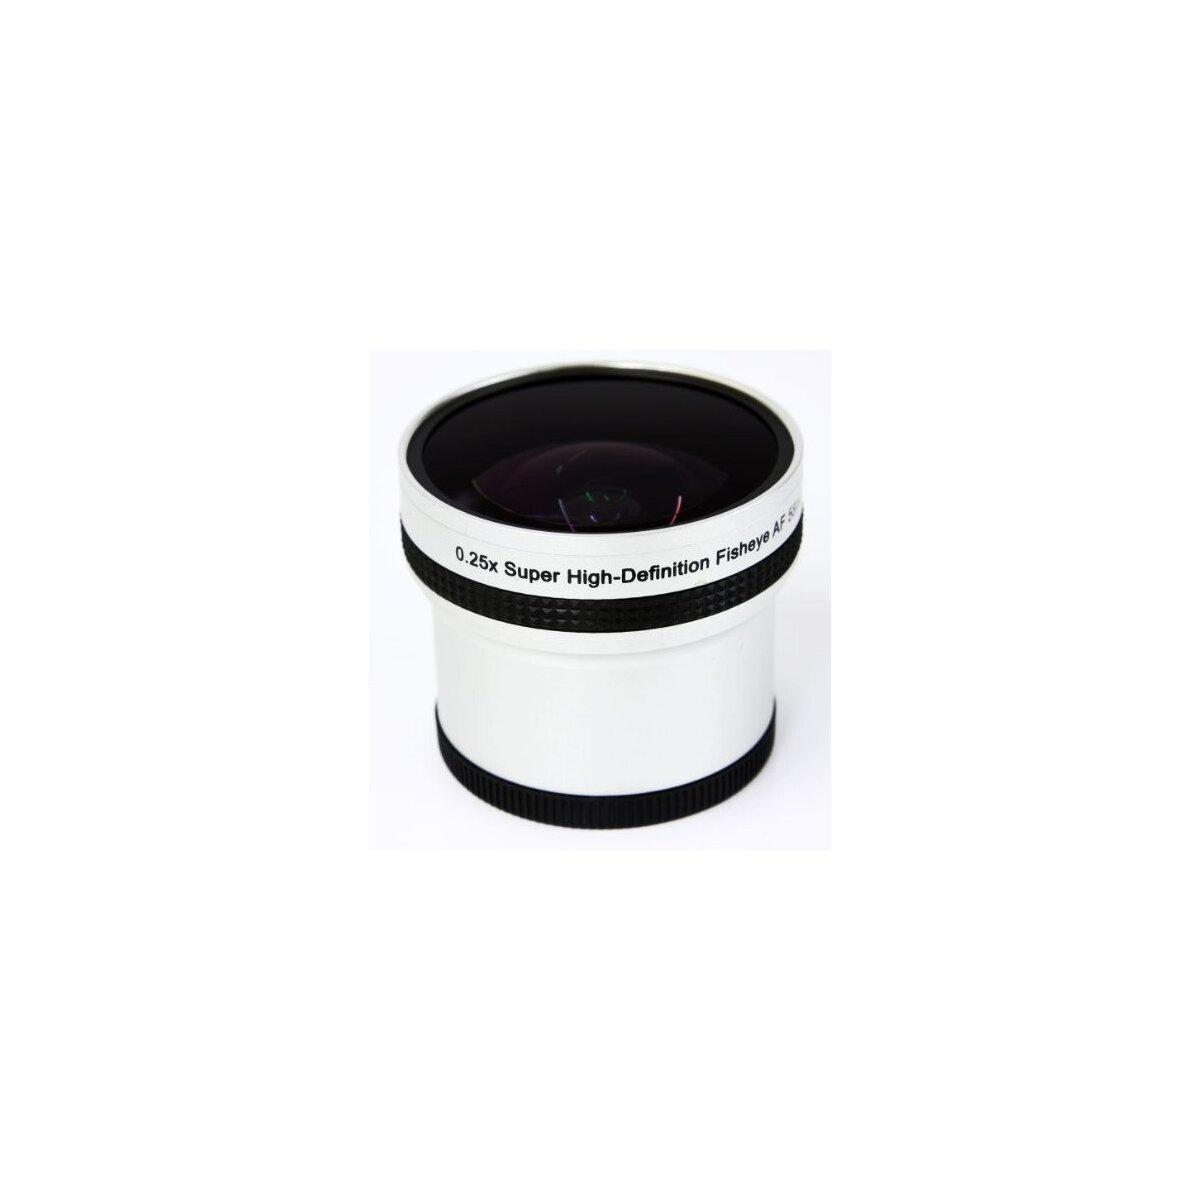 0.25x Fisheye Objektiv fuer Canon HG10, HV20, HV30, HV40, Legria HF M41, Legria HF M46, Legria HF M406 inkl. Adapter auf 43mm in silber